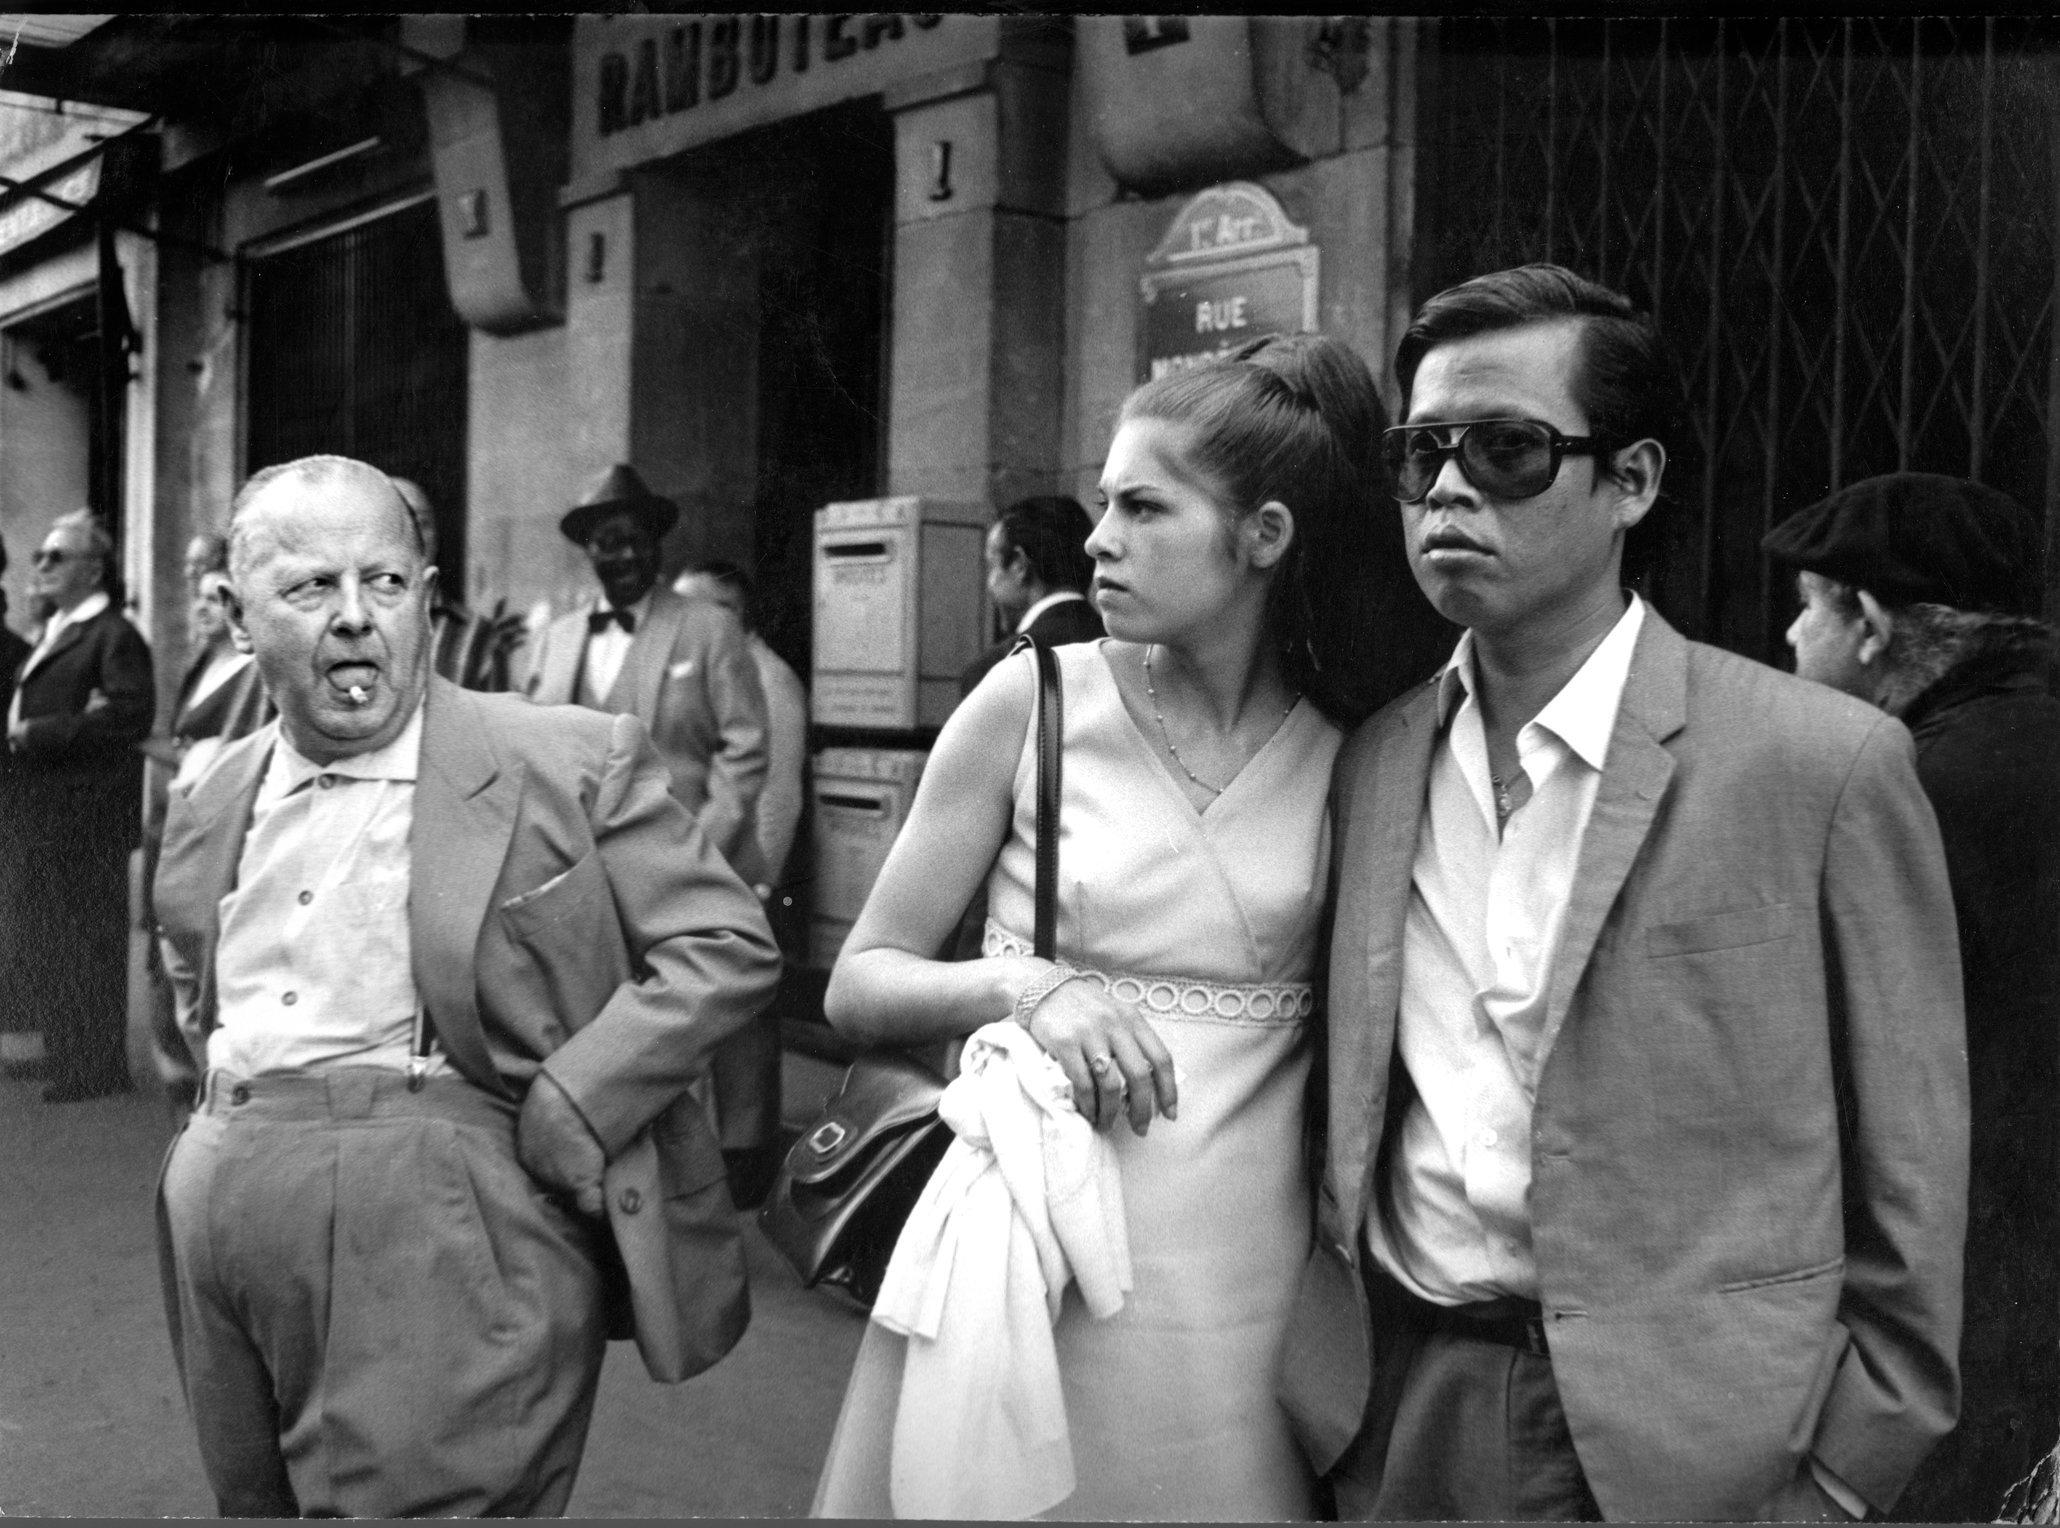 Paris man with cigarette.jpg